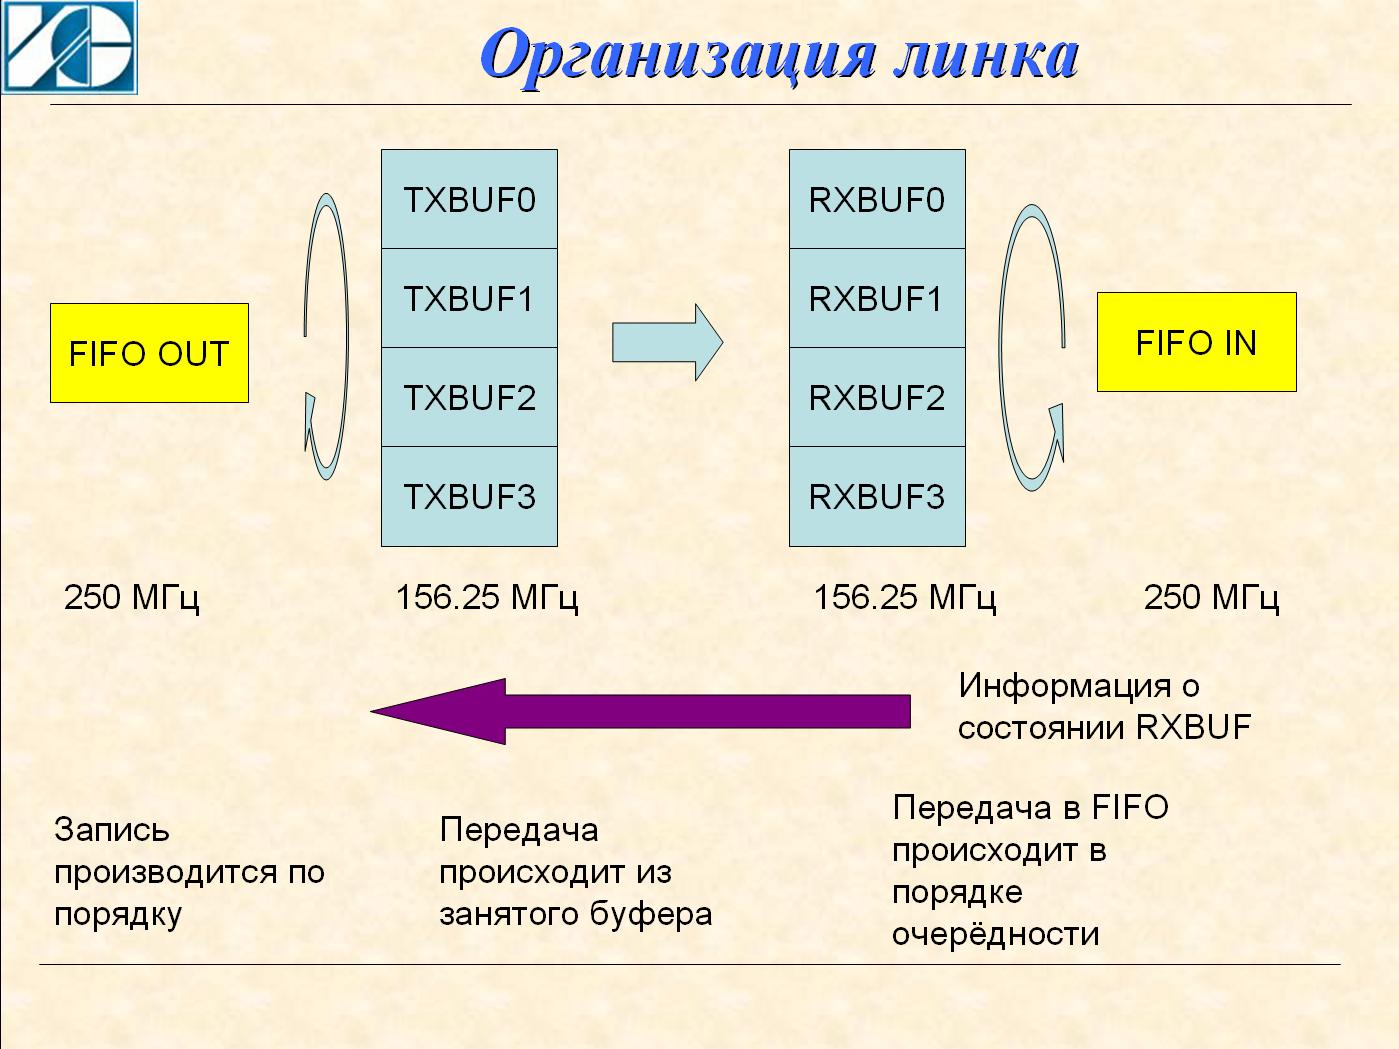 PROTEQ — протокол обмена по мультигигабитным линиям для ПЛИС Xilinx - 1